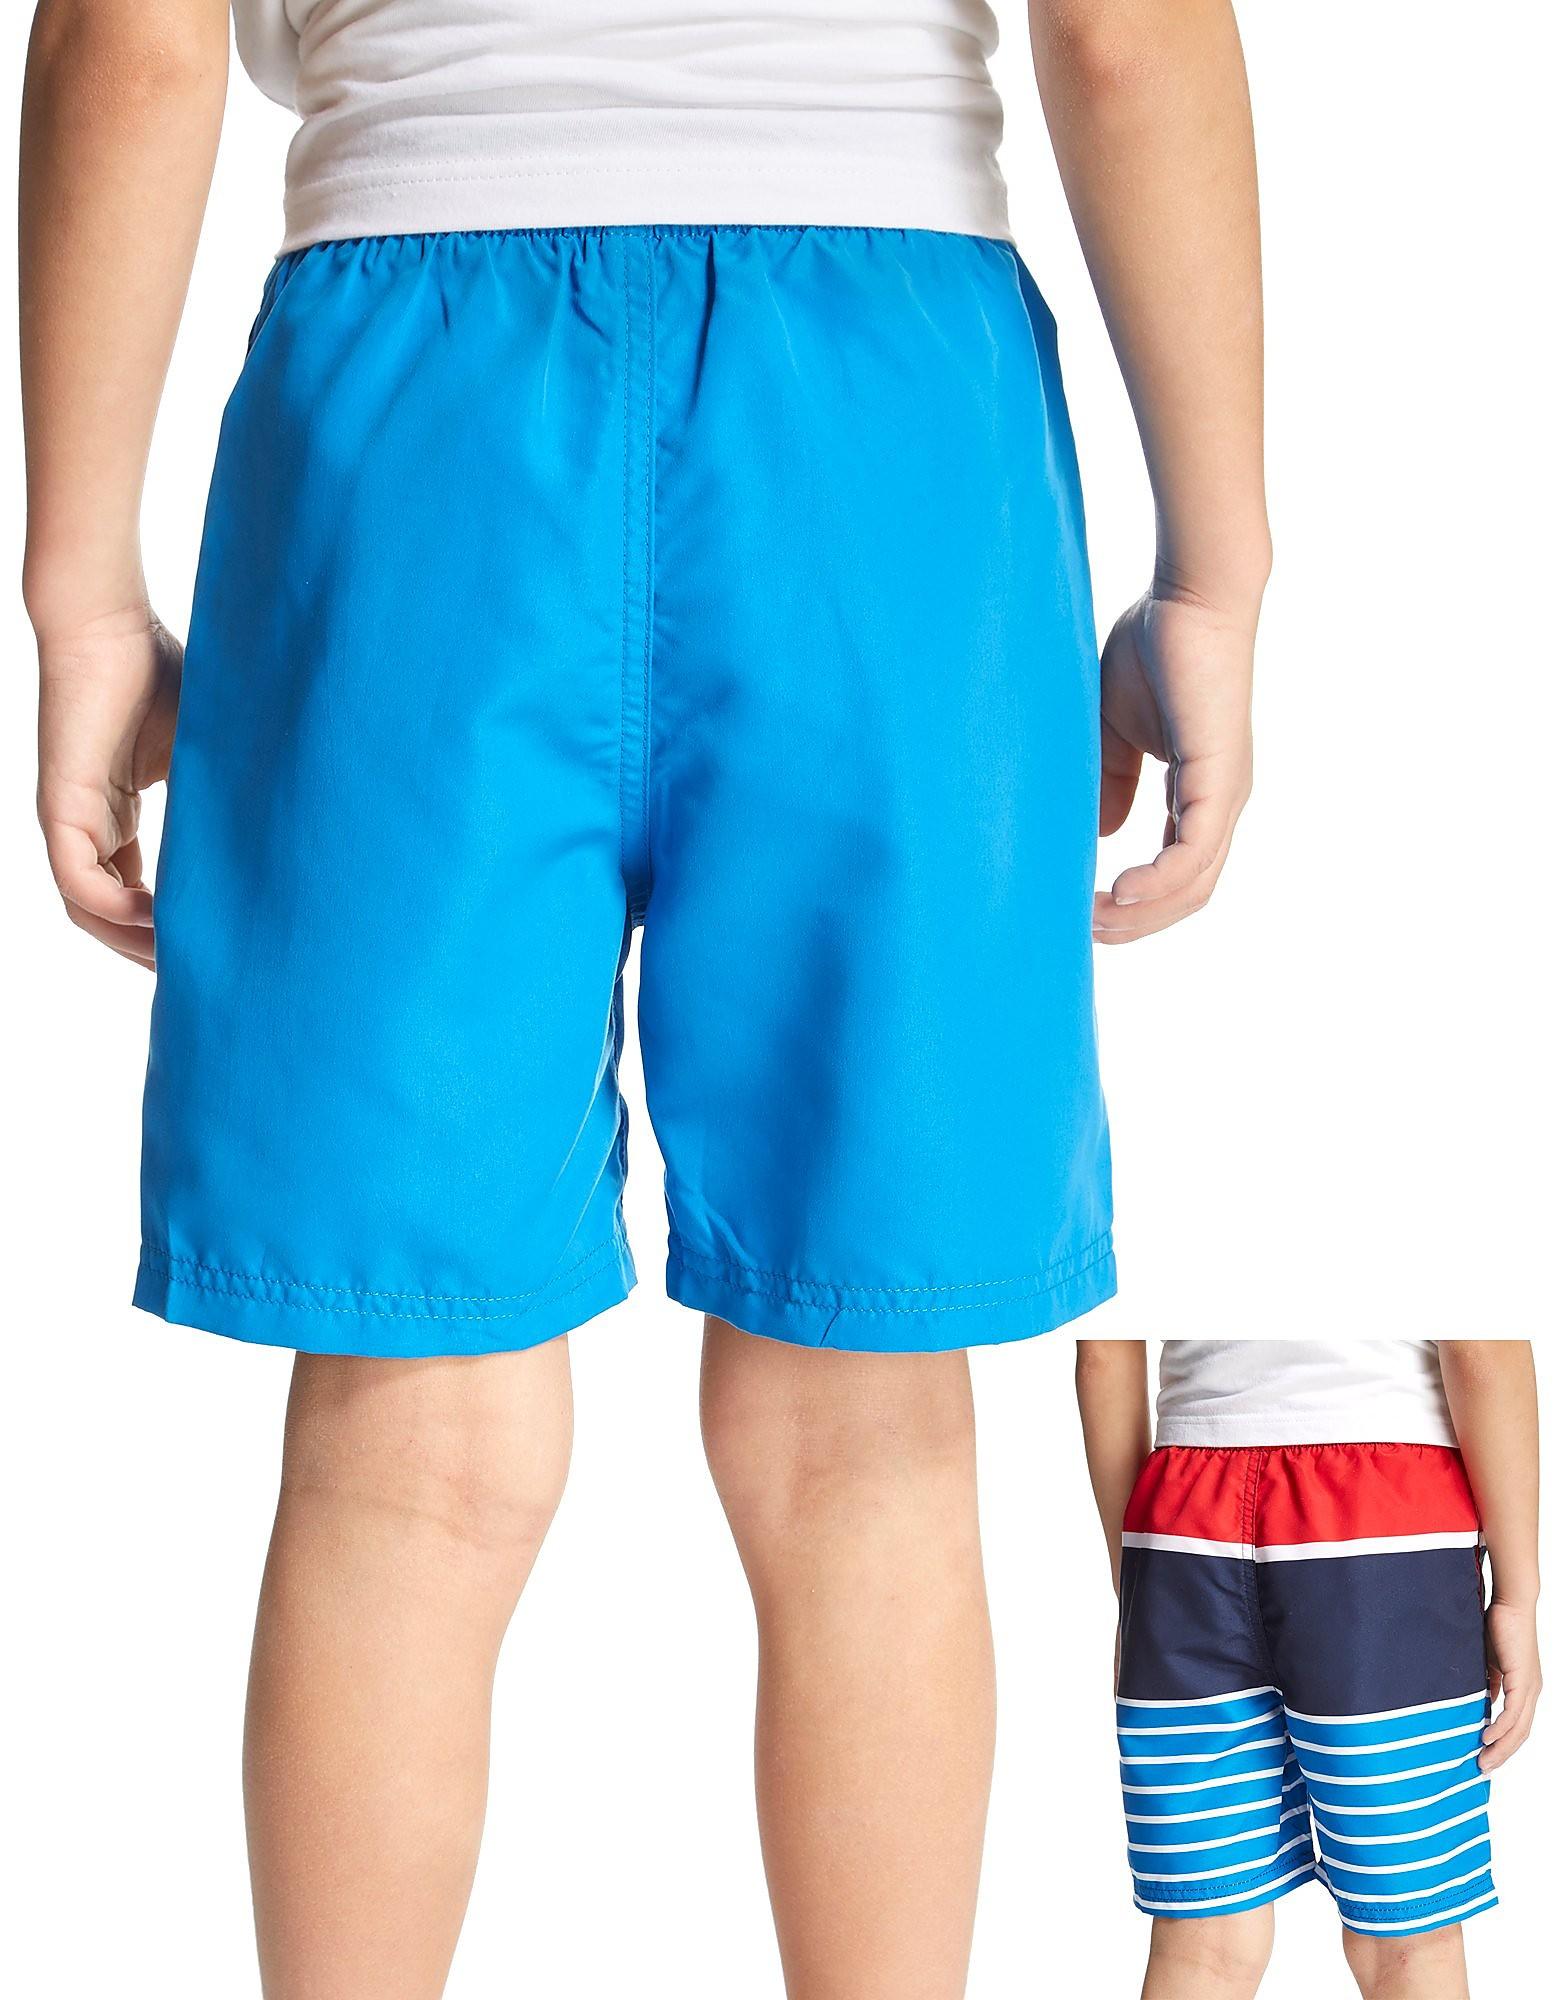 McKenzie Layton 2 Pack Swim Shorts Children